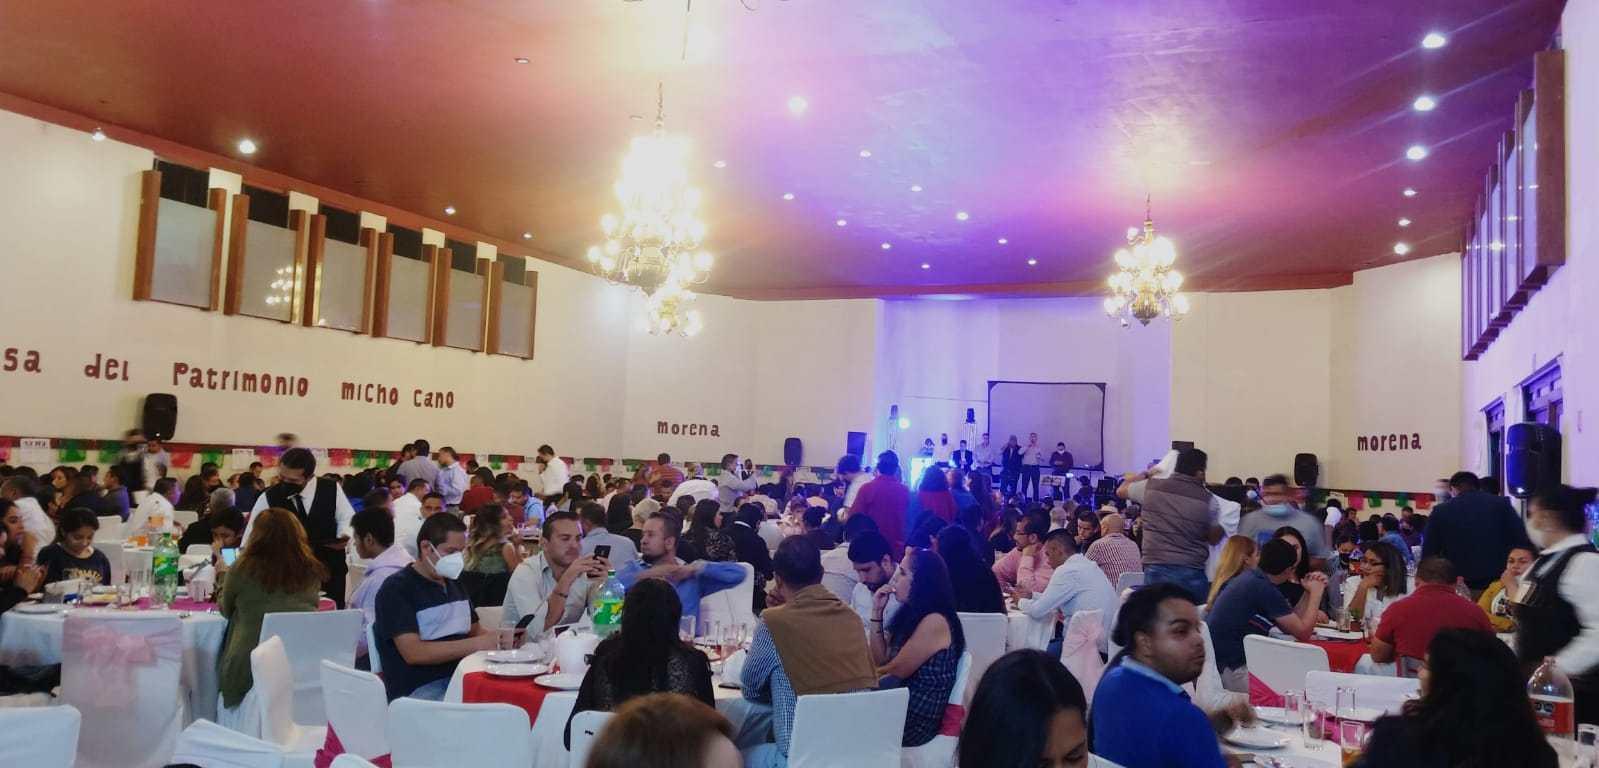 Cena Moreliana por la defensa del patrimonio Michoacano